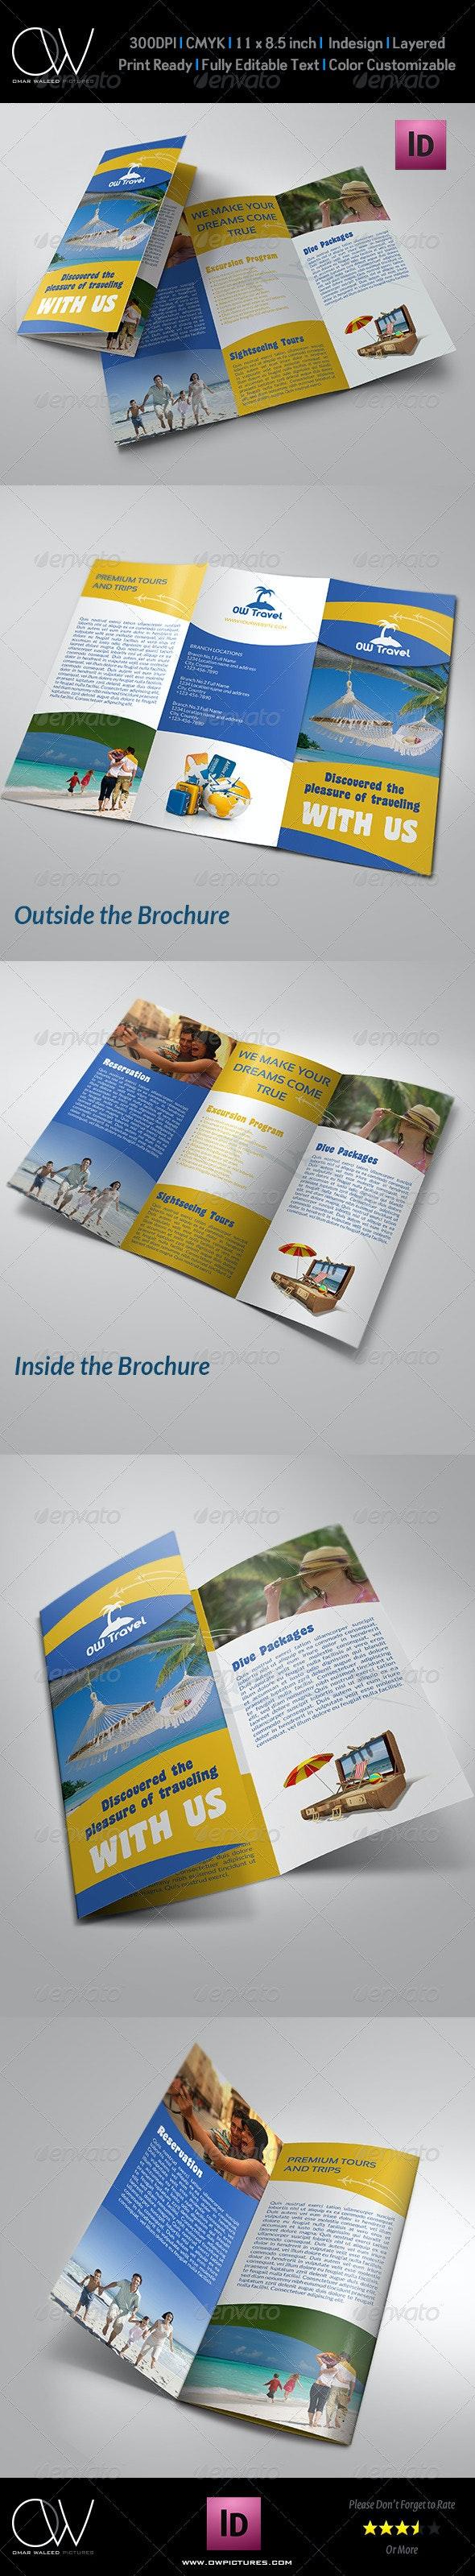 Travel Company Tri Fold Brochure Template - Informational Brochures